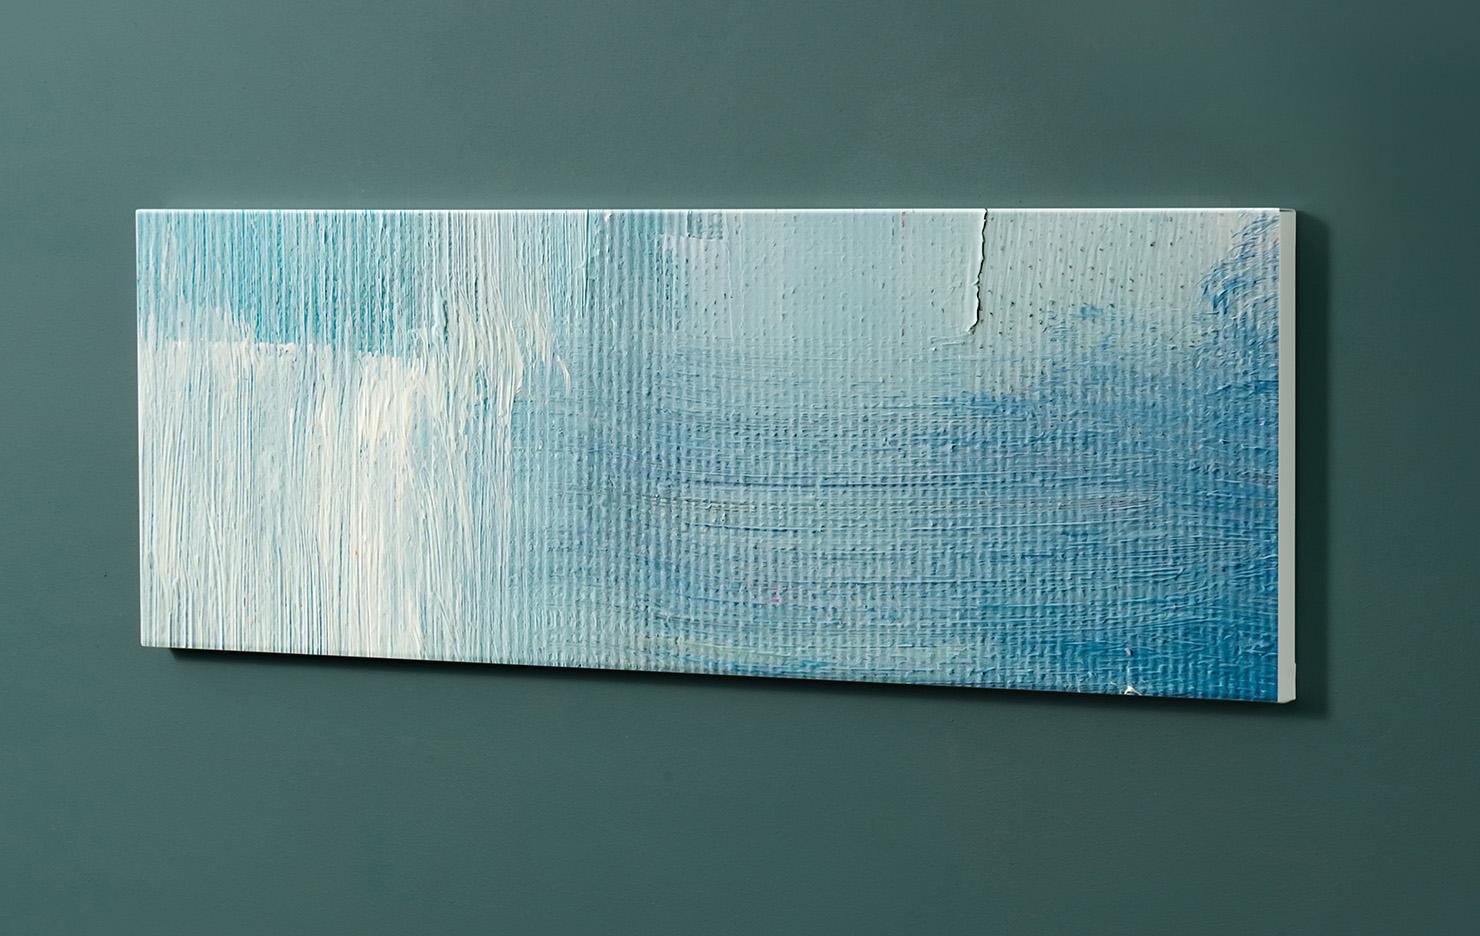 Magnettafel NOTIZ 90x30cm Motiv-Pinnwand M122 Abstrakt Kunst